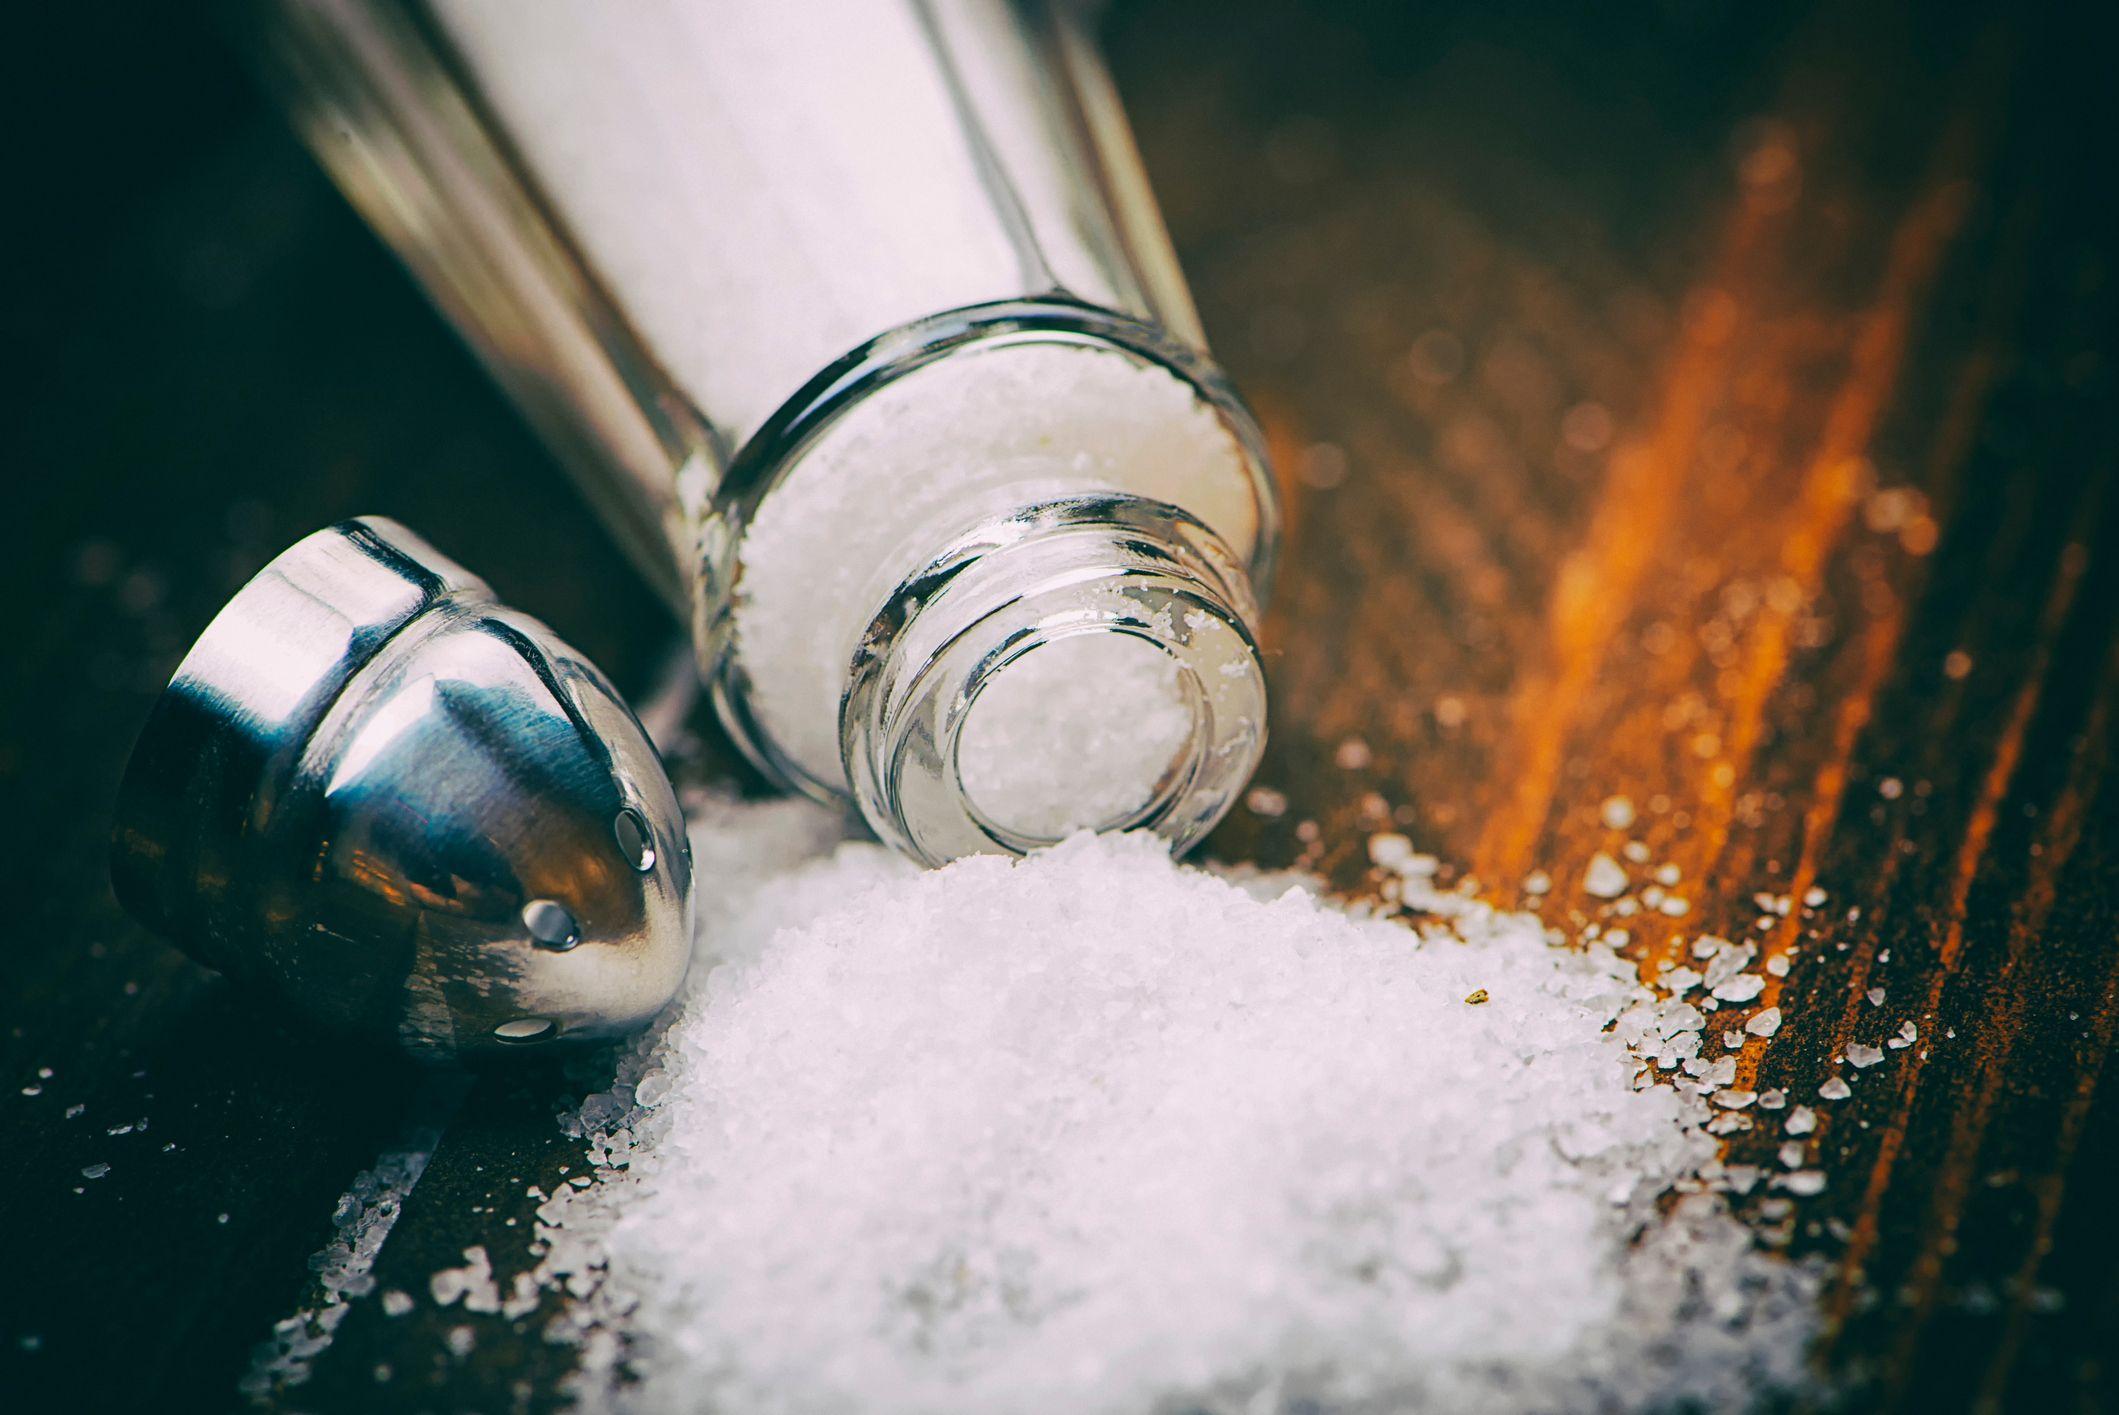 Iodine Deficiency Symptoms - Signs of Low Iodine